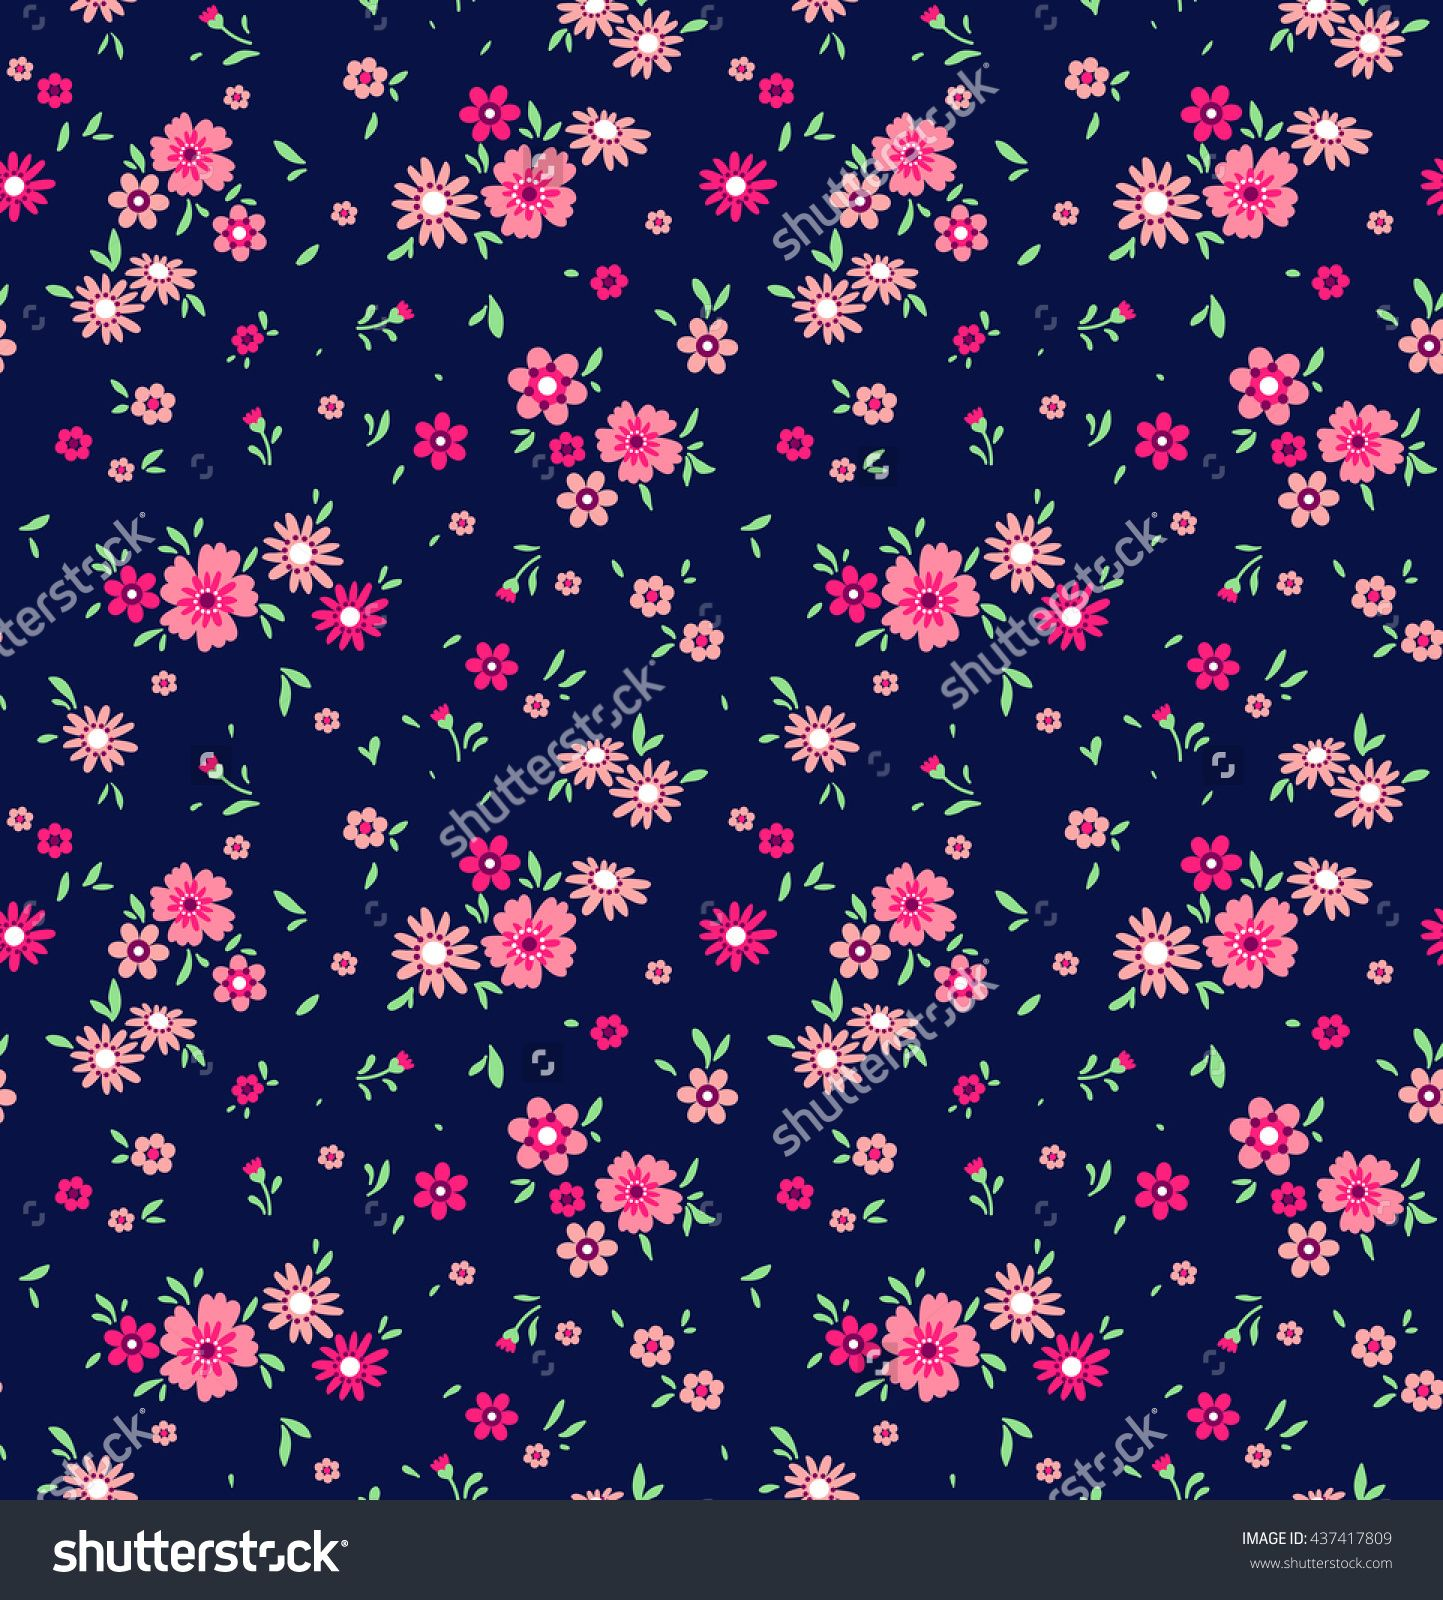 Cute pattern in small flower. Small pink flowers. Dark